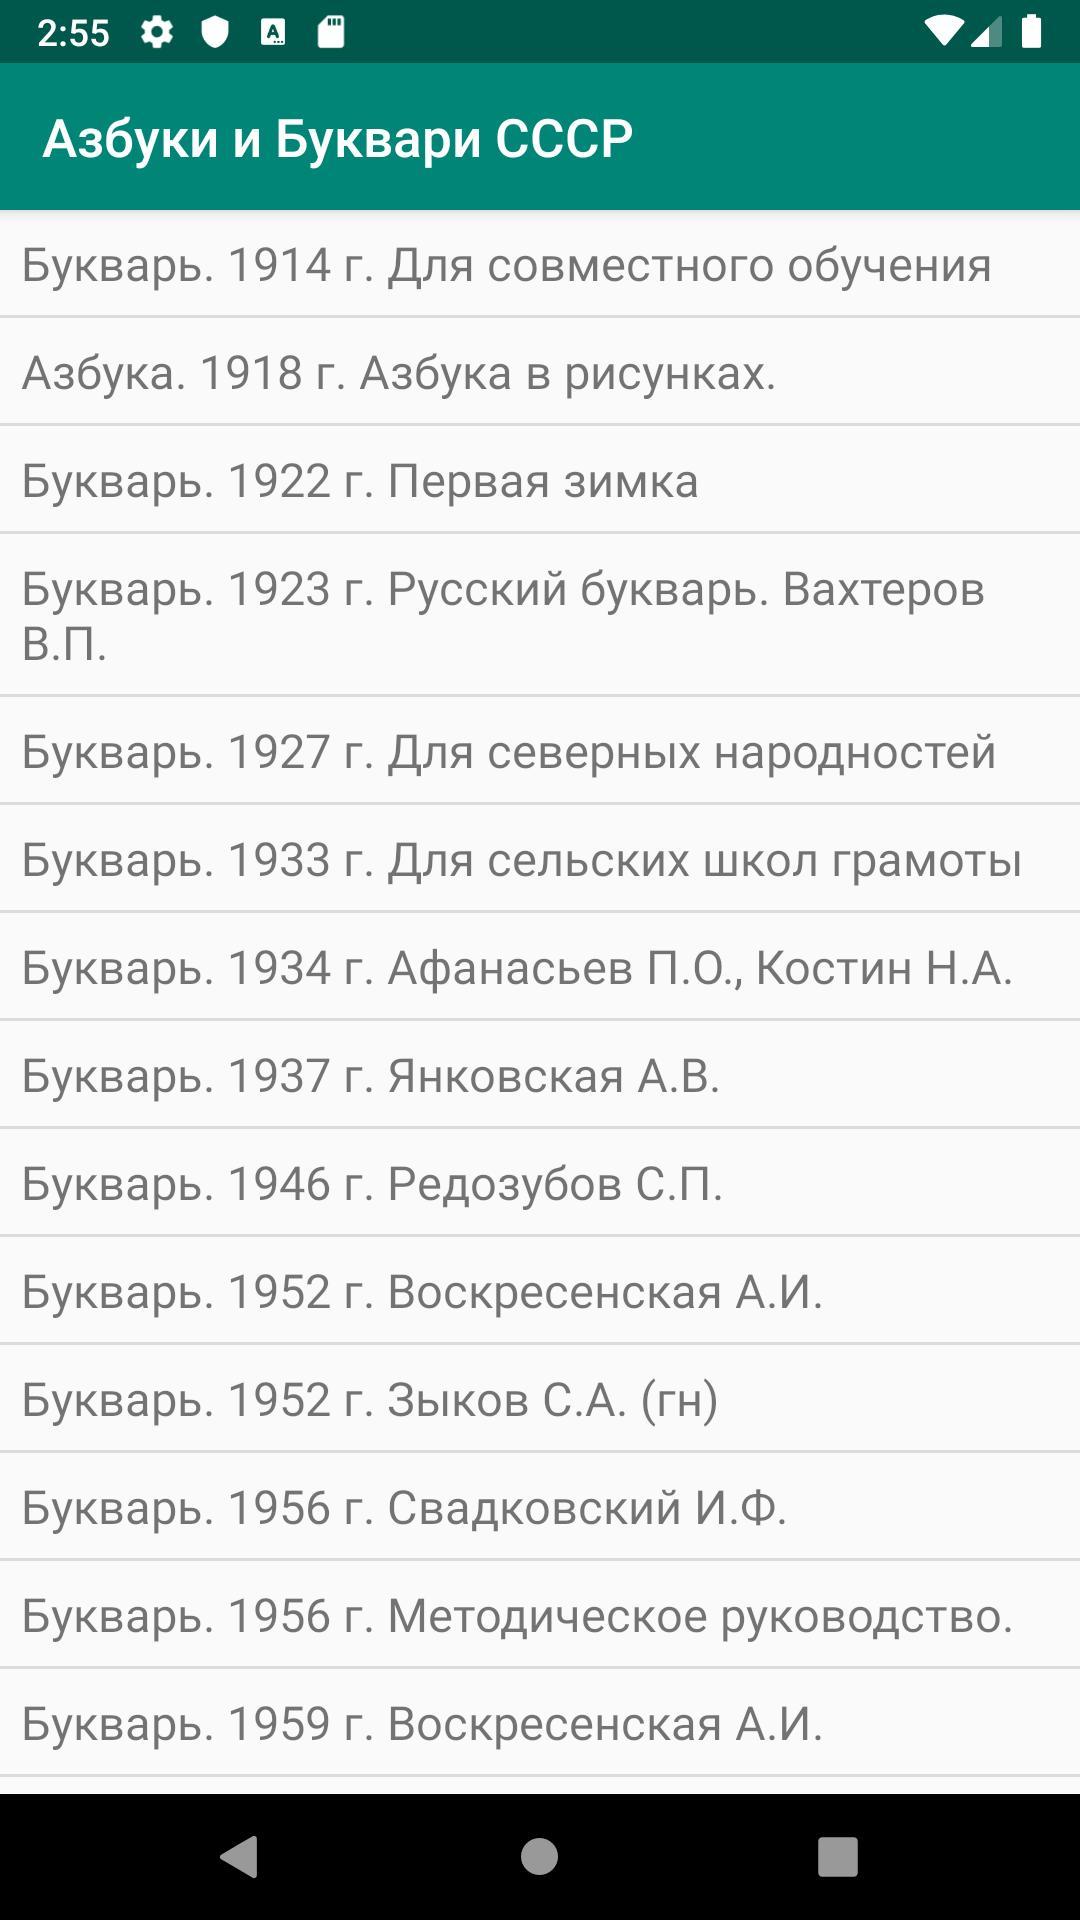 Русская азбука или буквица, картинки. Изучение азбуки сравнимо с ...   1920x1080